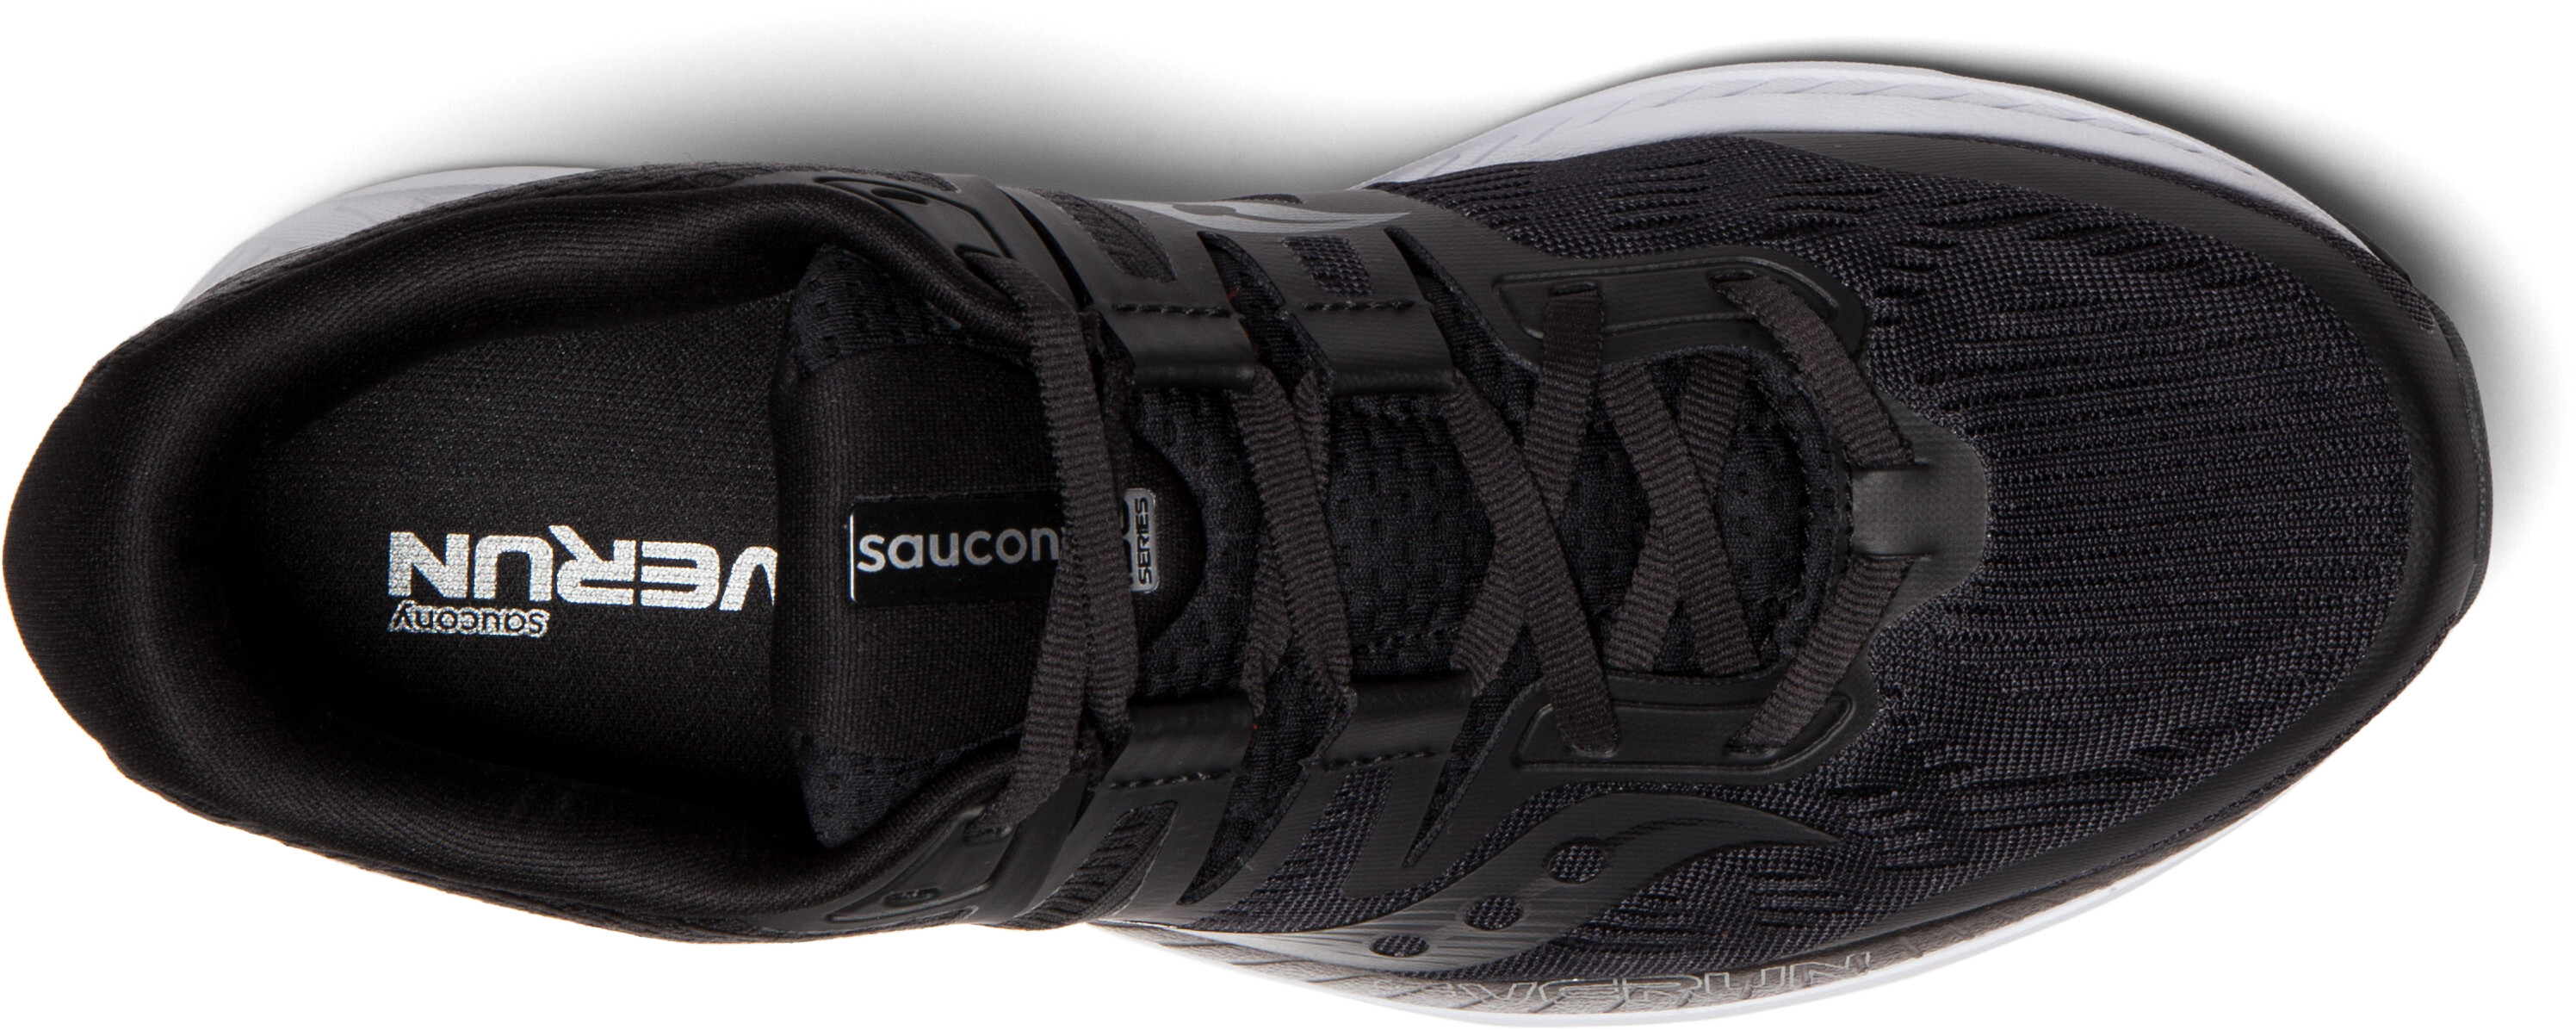 1da9a2dc954 saucony Ride ISO - Chaussures running Homme - noir sur CAMPZ !